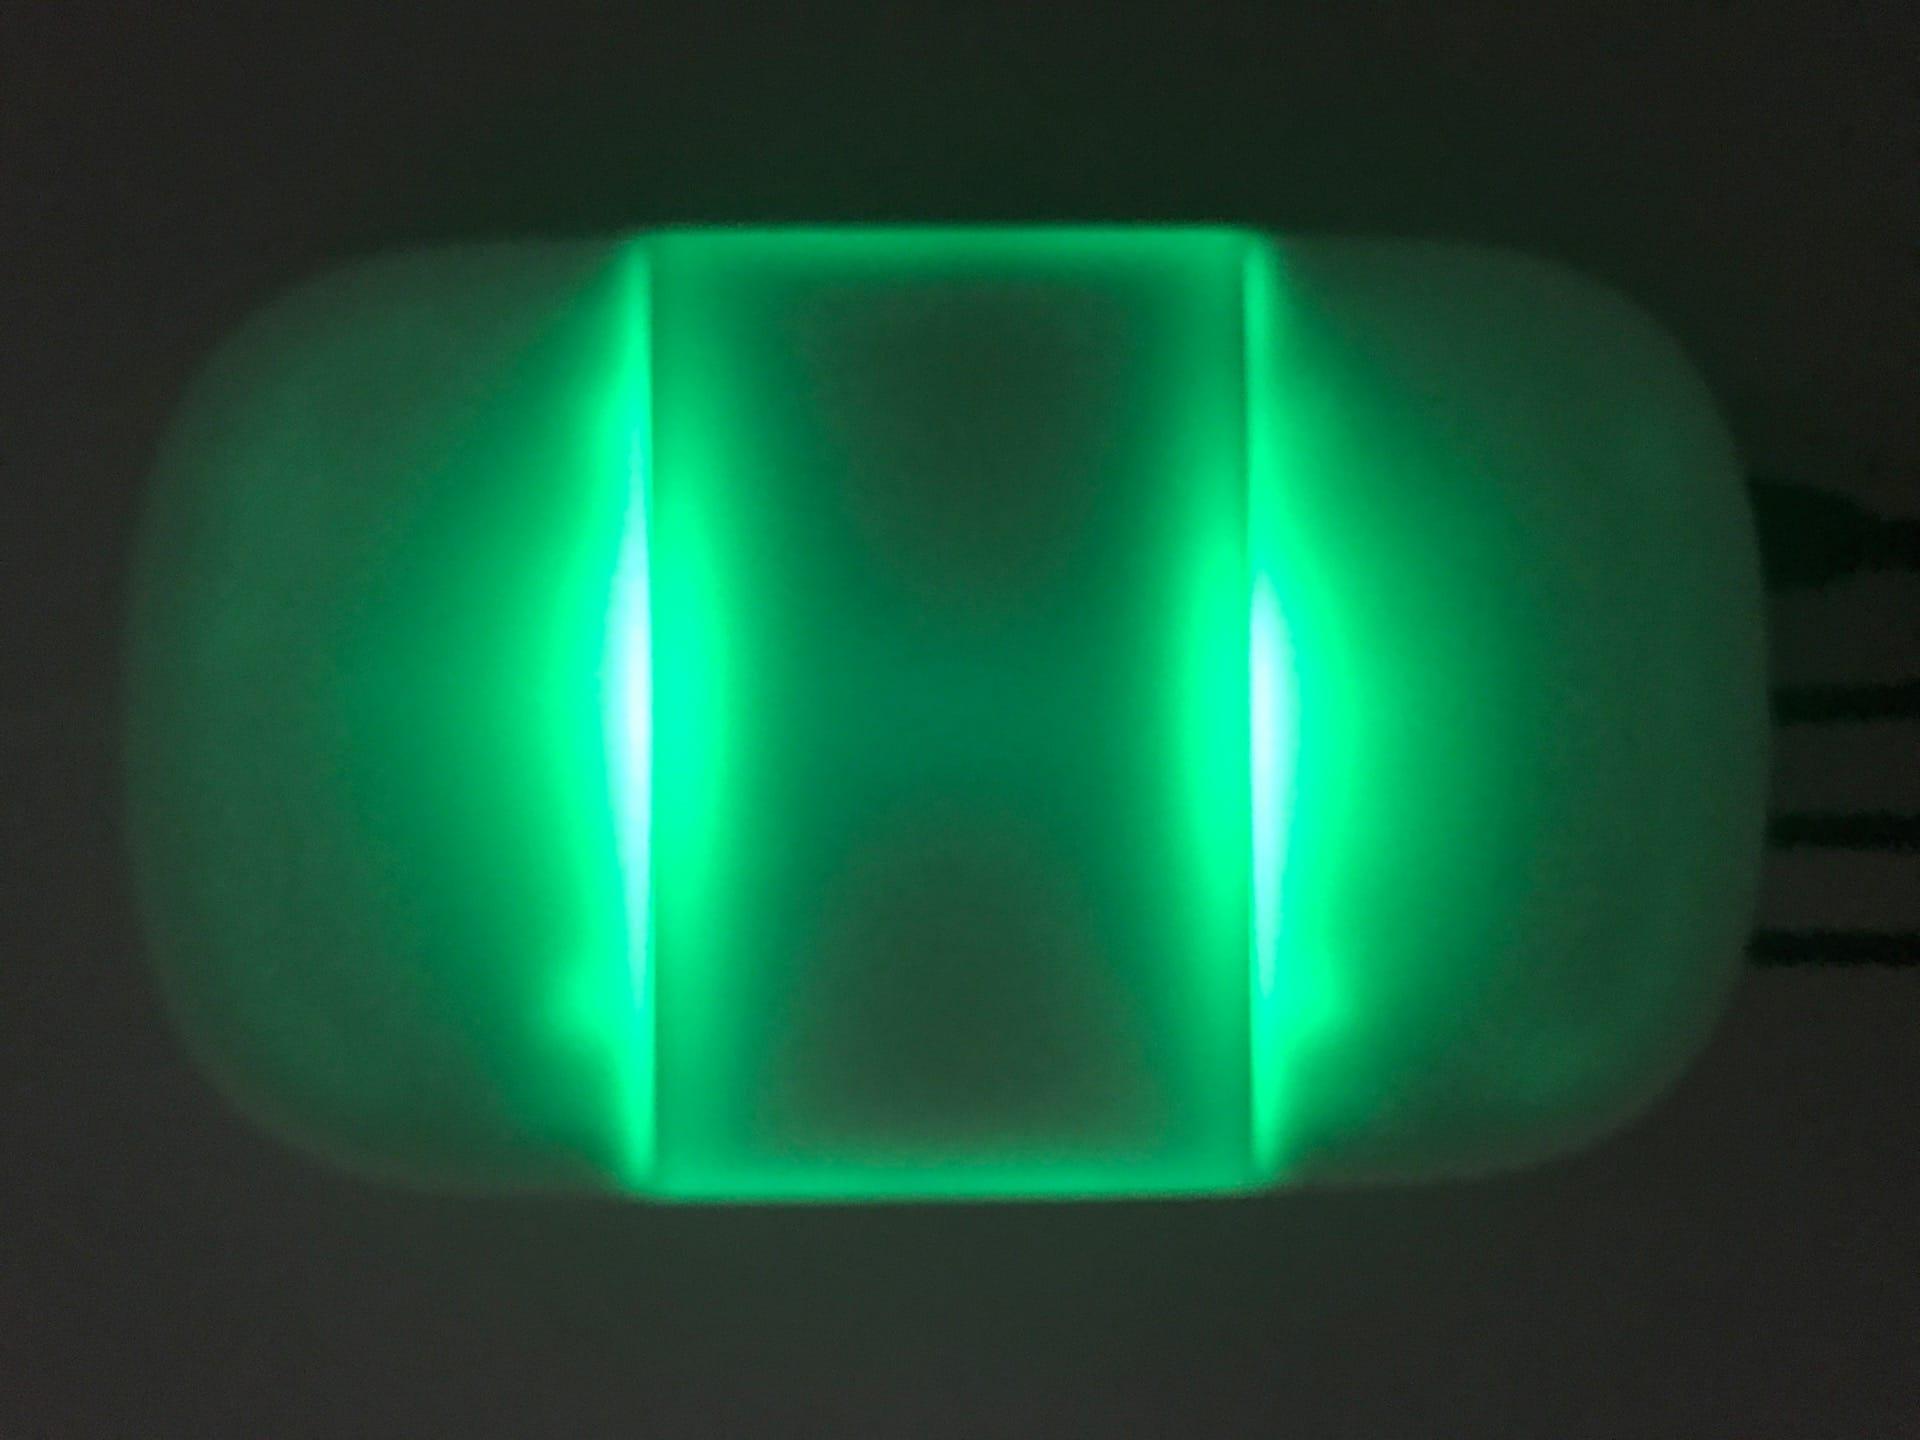 Smappee Monitor: Grünes LED-Licht atmet im Normal-Betrieb.